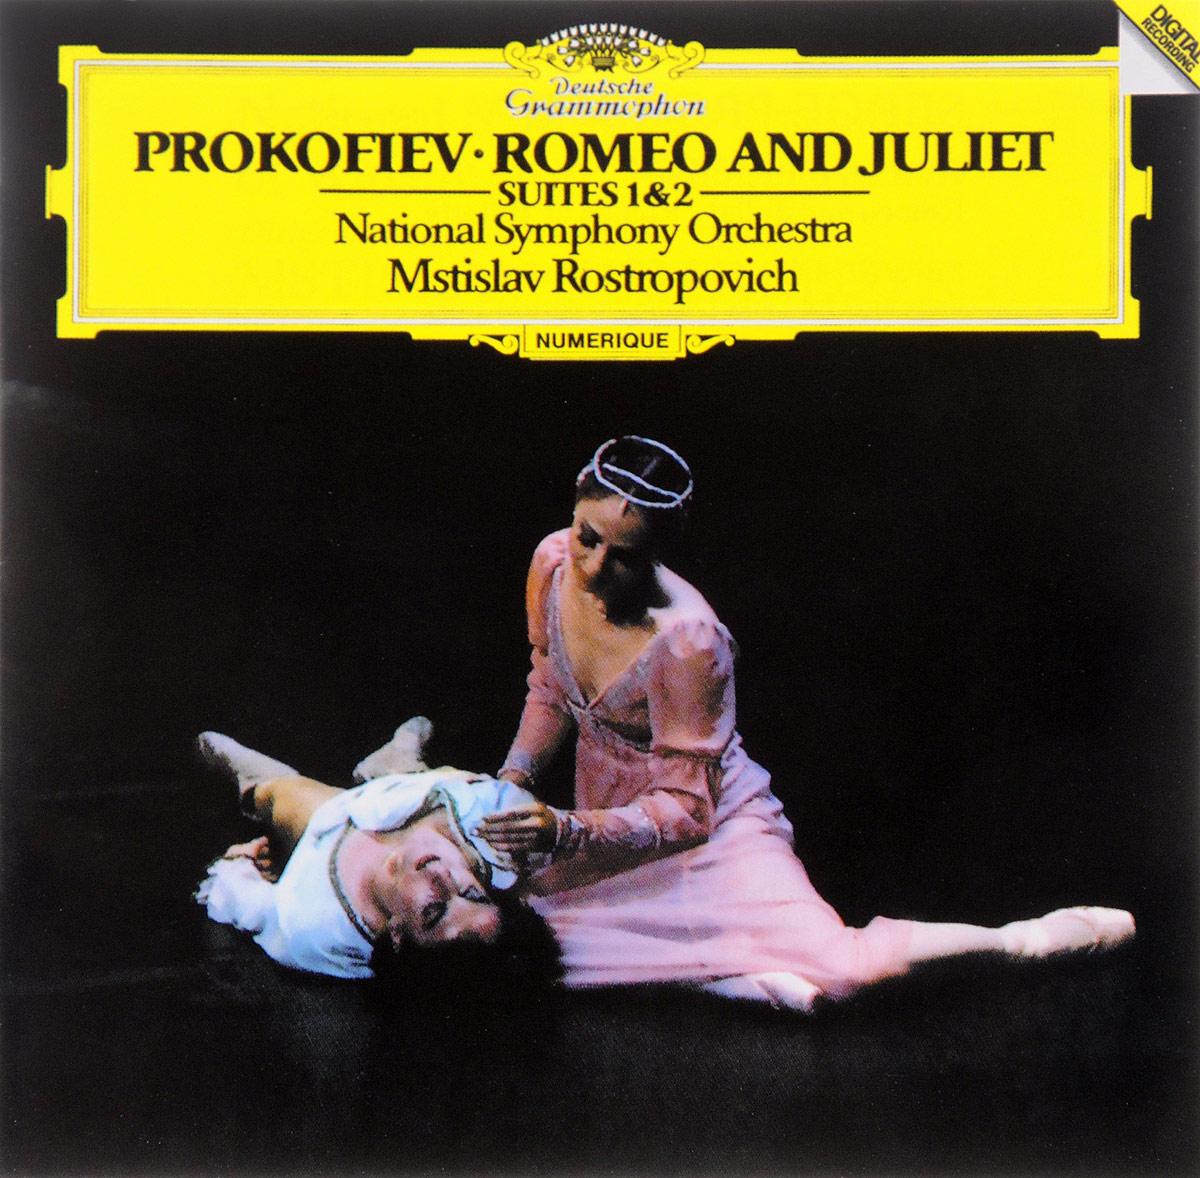 лучшая цена Мстислав Ростропович,National Symphony Orchestra Of Washington Mstislav Rostropovich, National Symphony Orchestra. Prokofiev. Romeo And Juliet. Suites 1 & 2